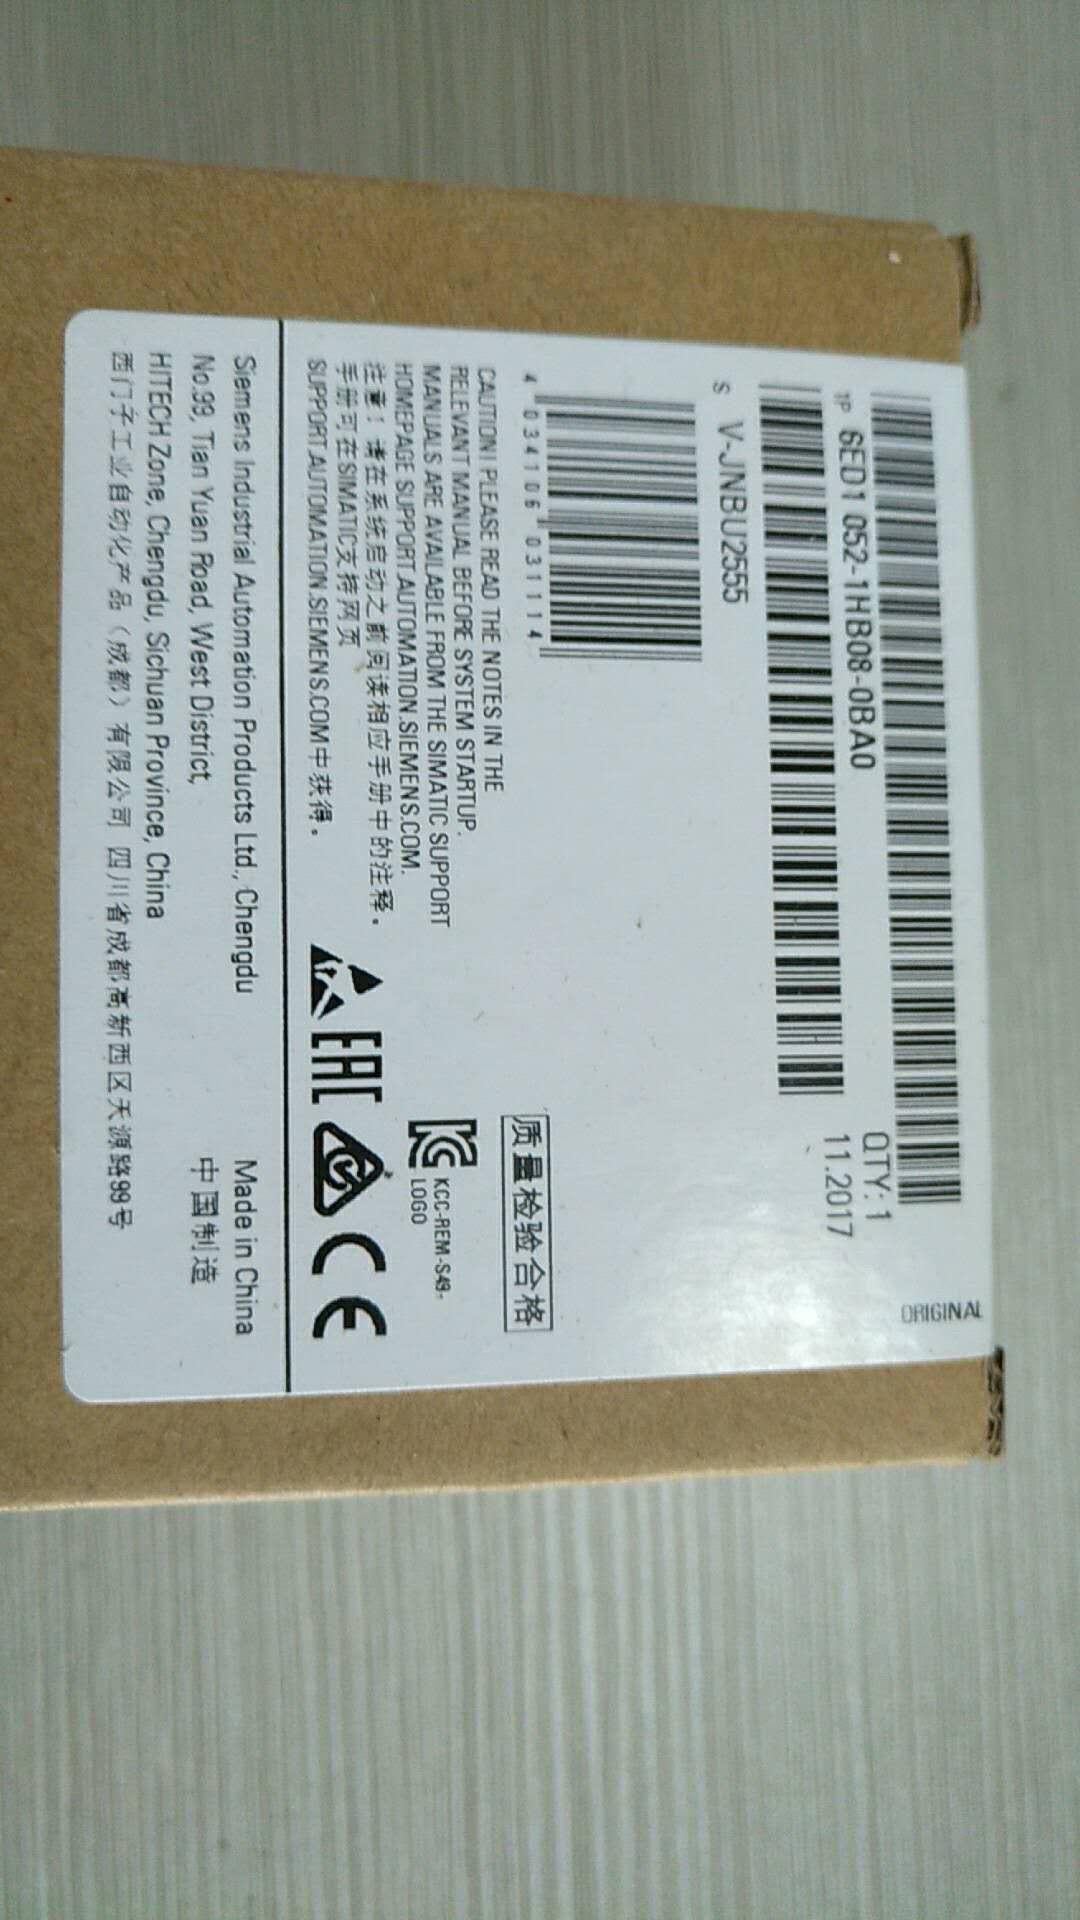 6ED1052-2MD08-0BA0 siemens logo logic module plc 12/24RCEO 400 Blocks